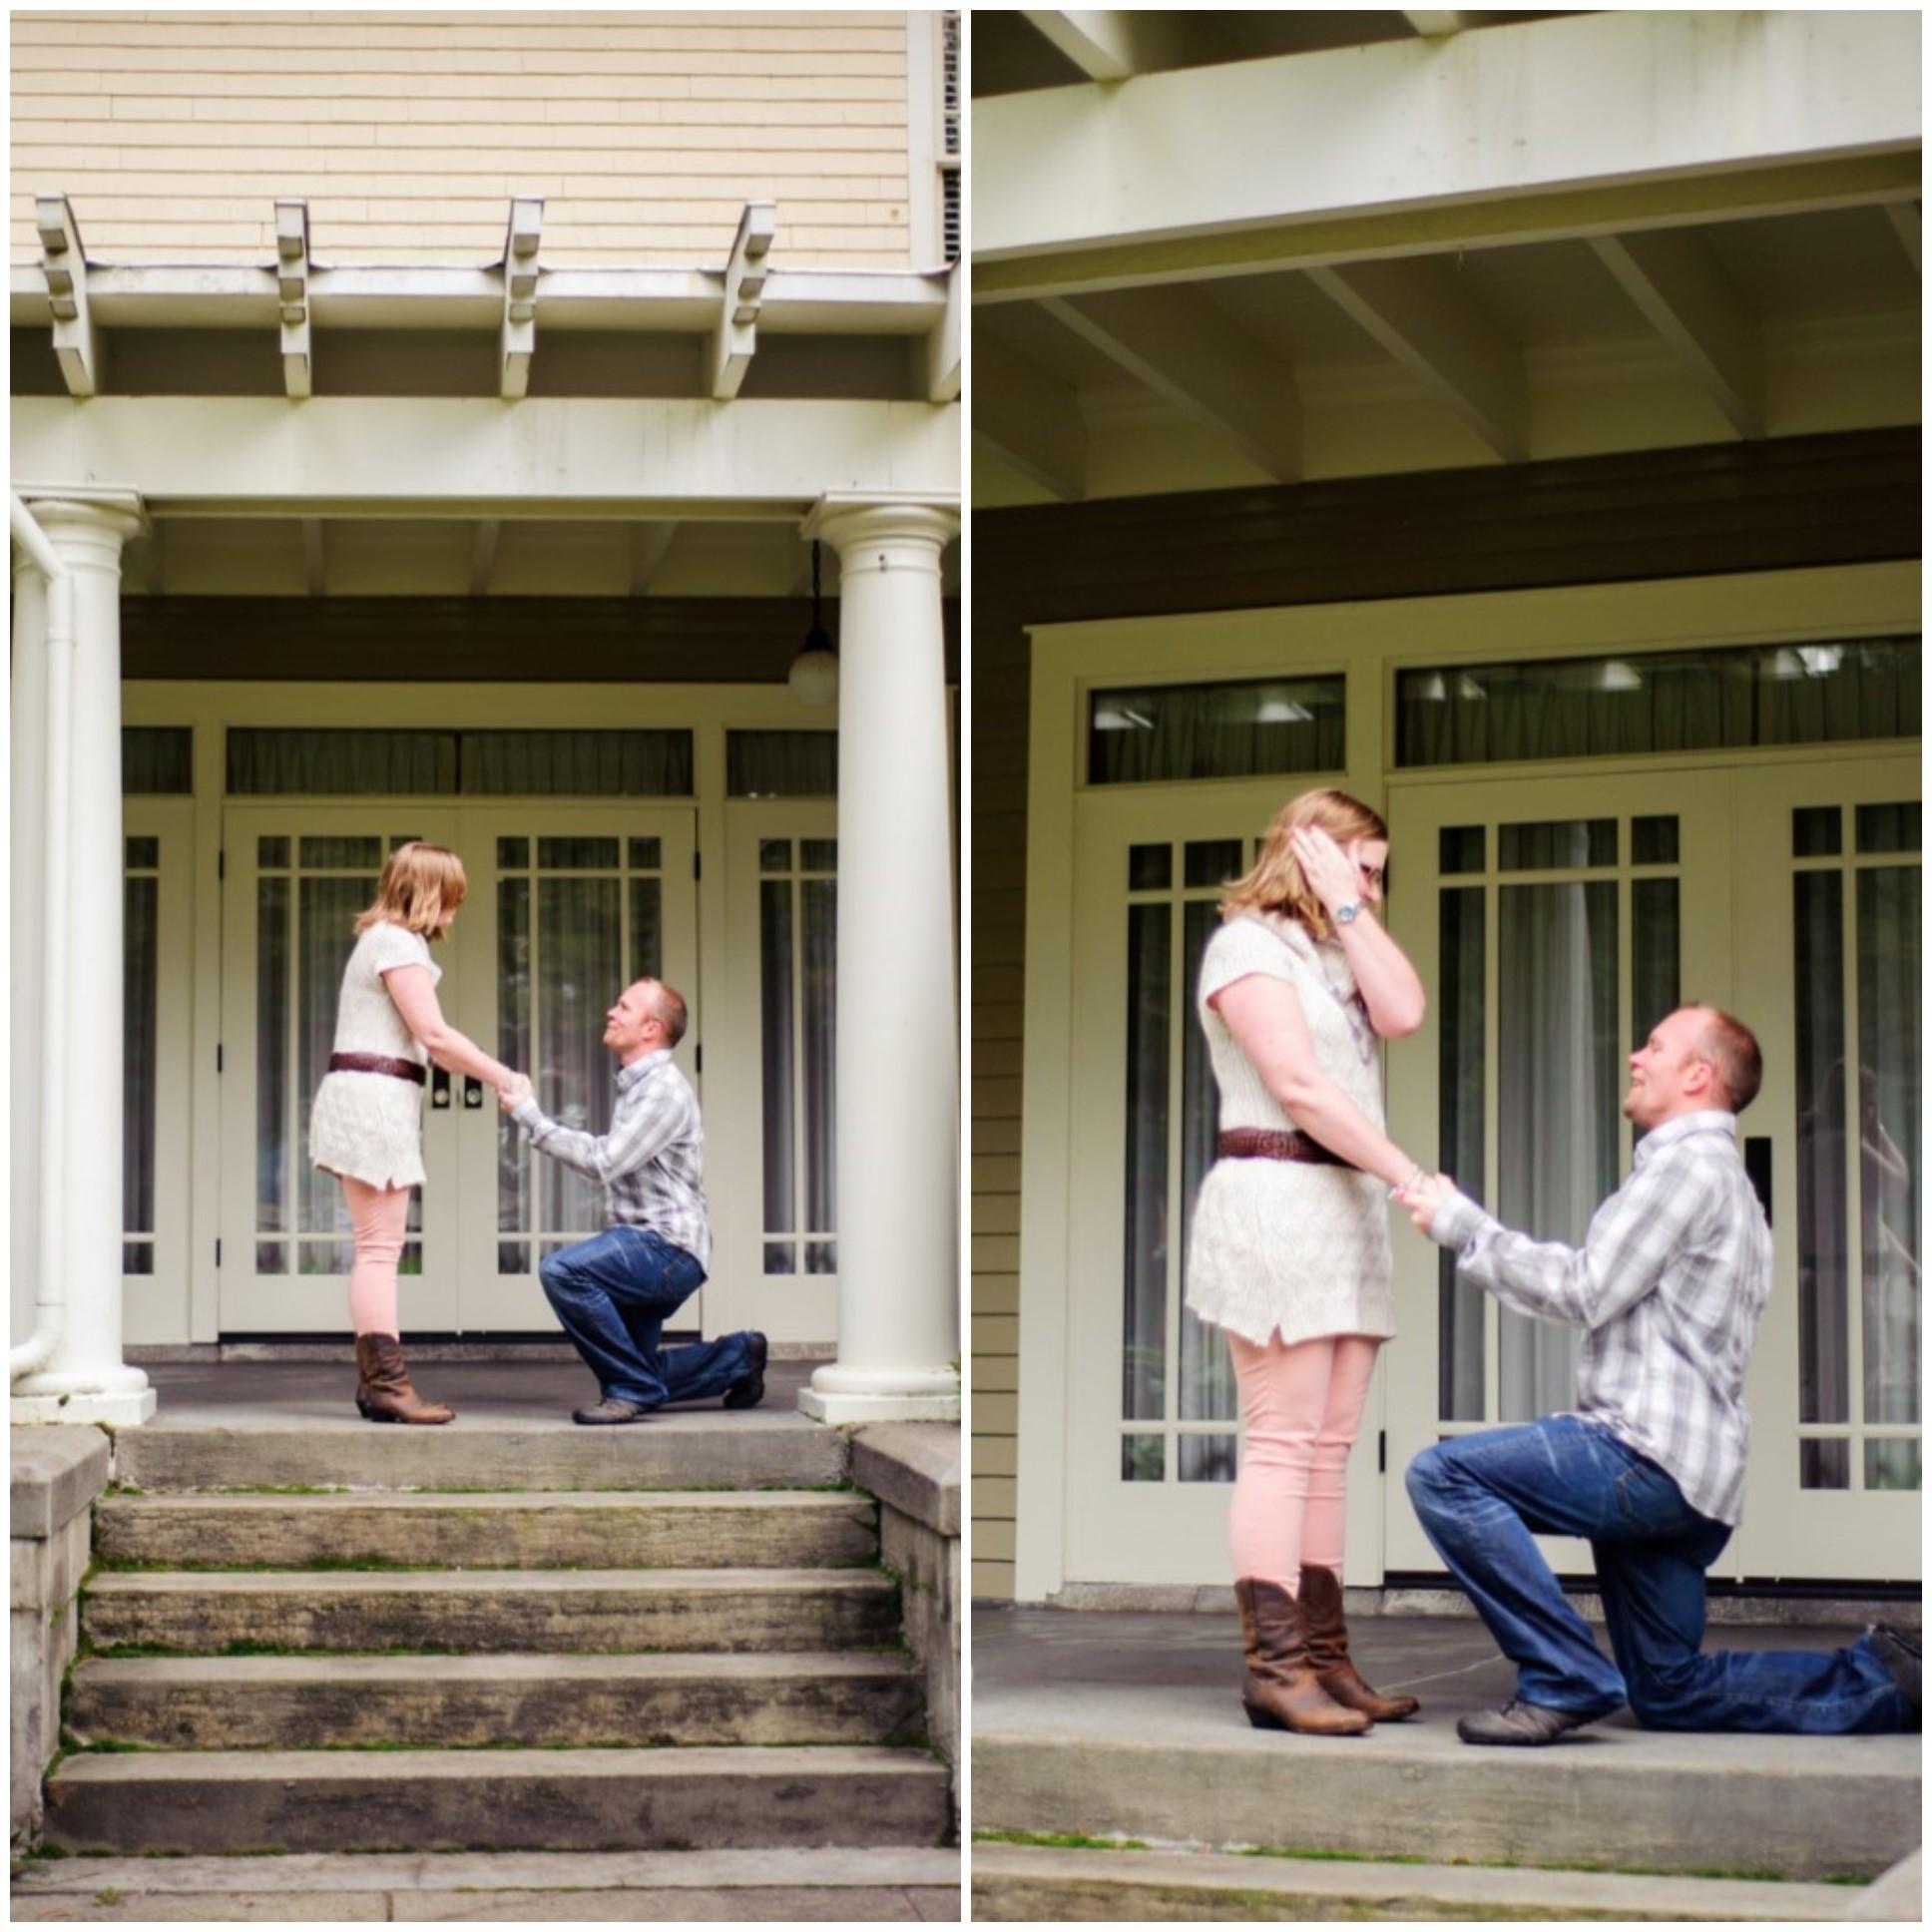 Image 2 of Nicholas and Melissa's Photo Shoot Proposal